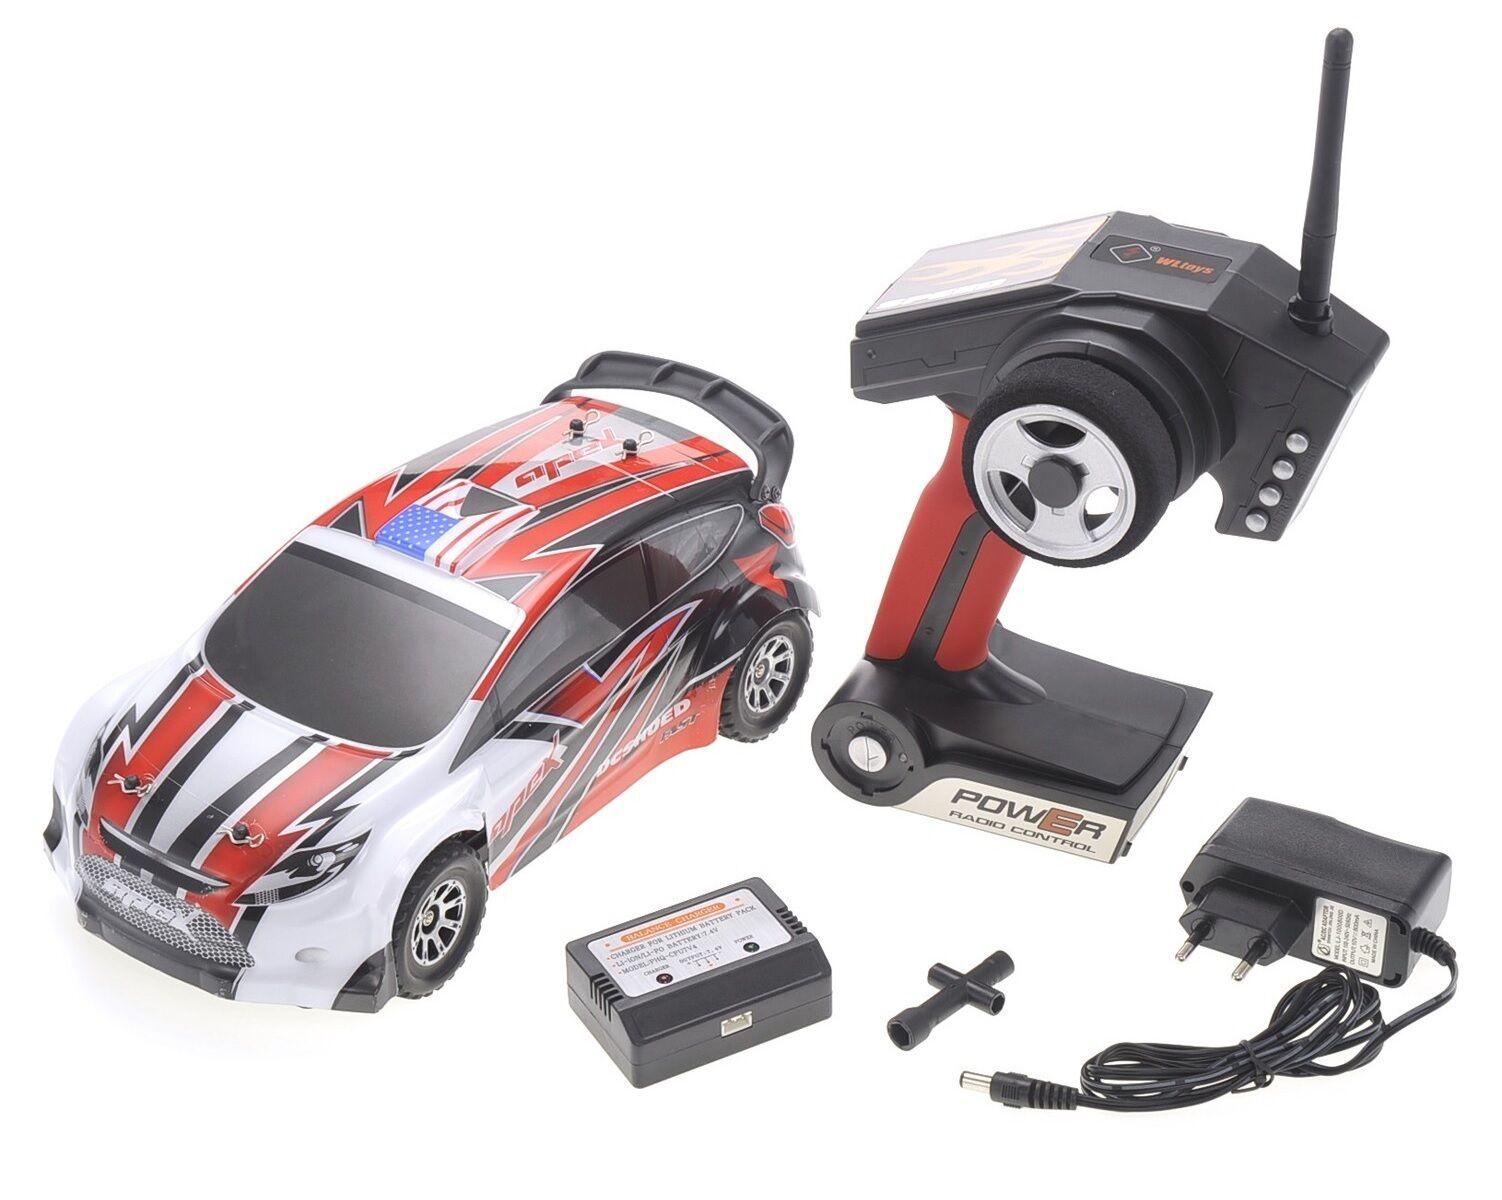 1 18 RC Rally Car Car Car Electric 2.4GHz Radio Remote Control 4WD RTR Red New c16941